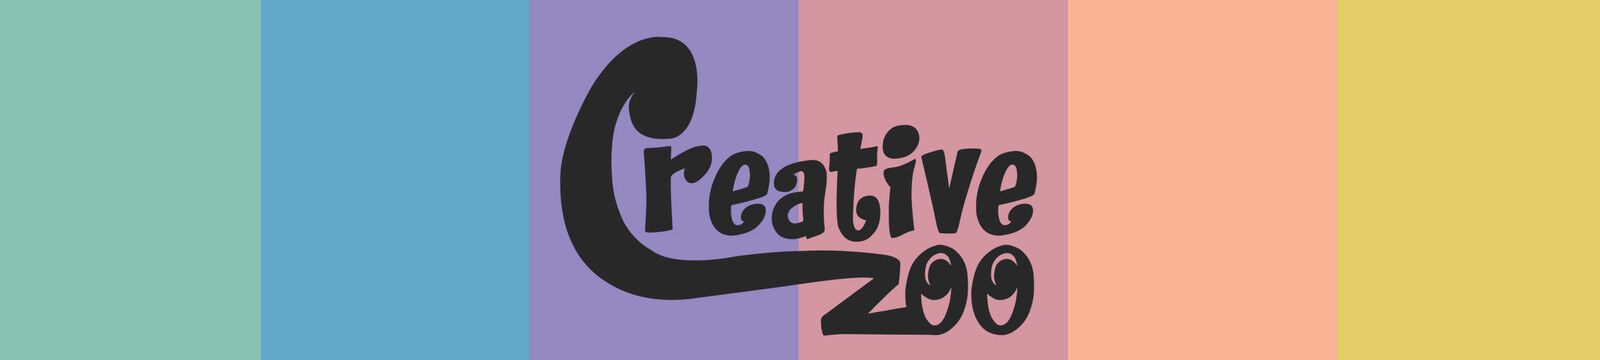 creativezooshop